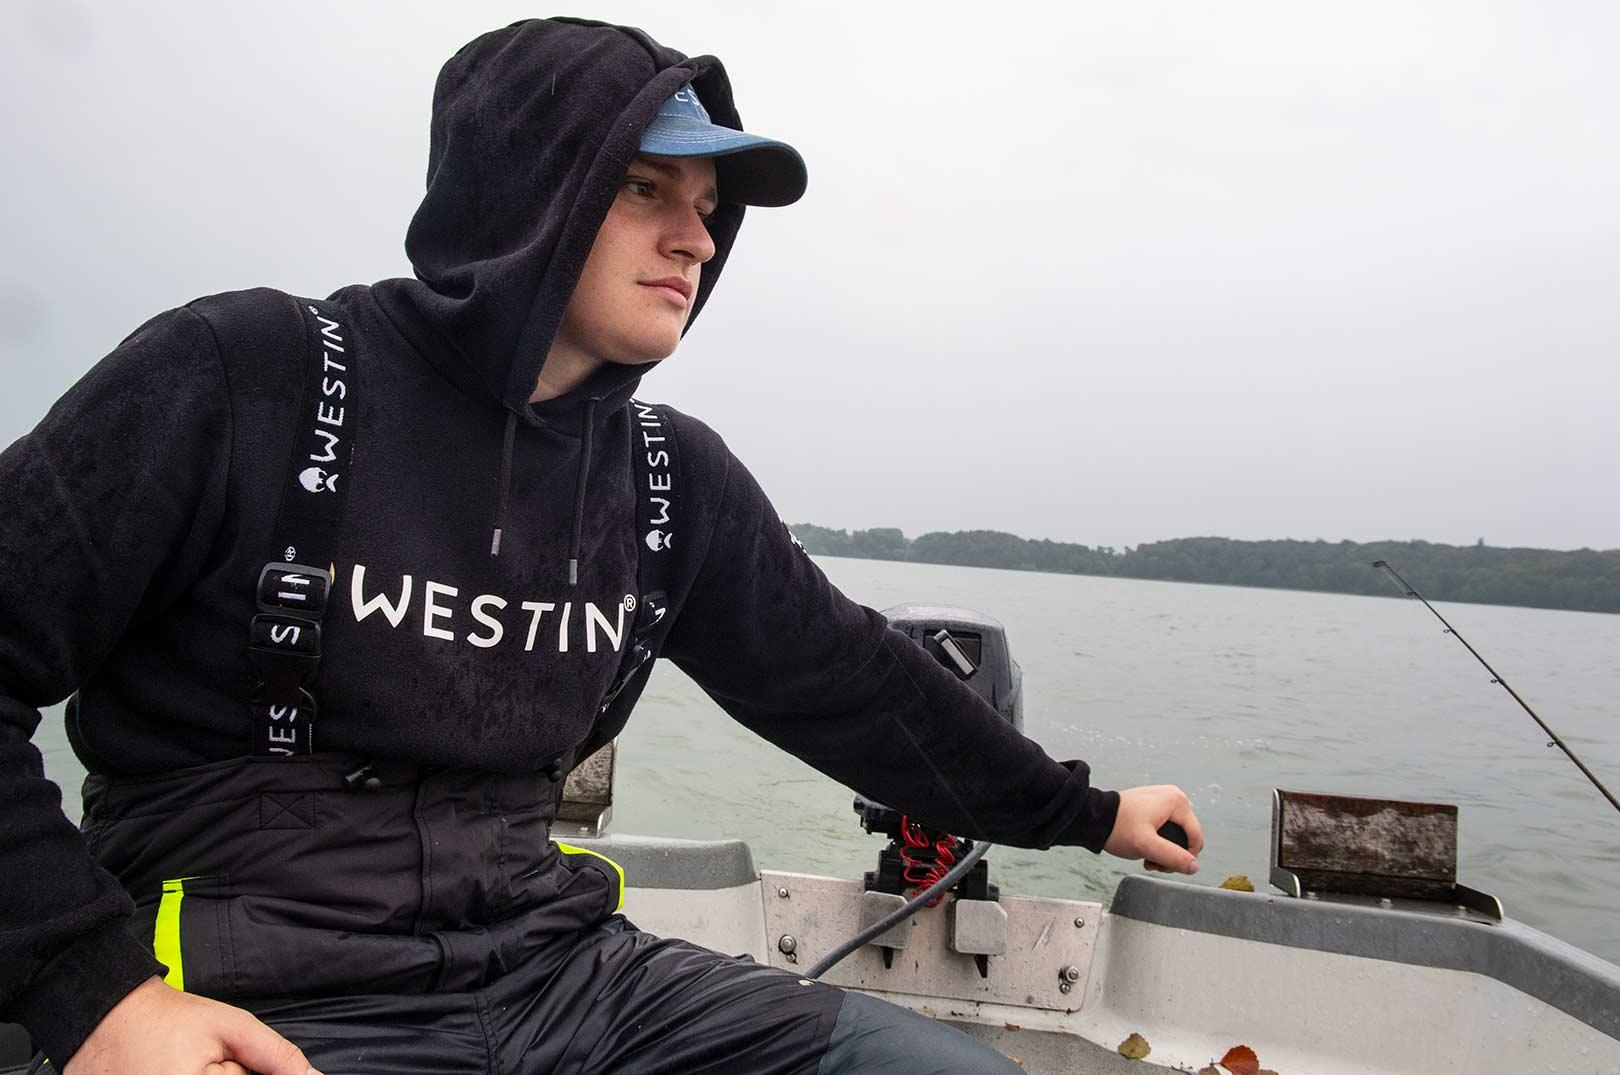 Rasmus Christensen er i sit rette element på de store søer - og når de drejer sig om sandart er det de færreste danske predatorfiskere, der når ham til sokkeholderne.